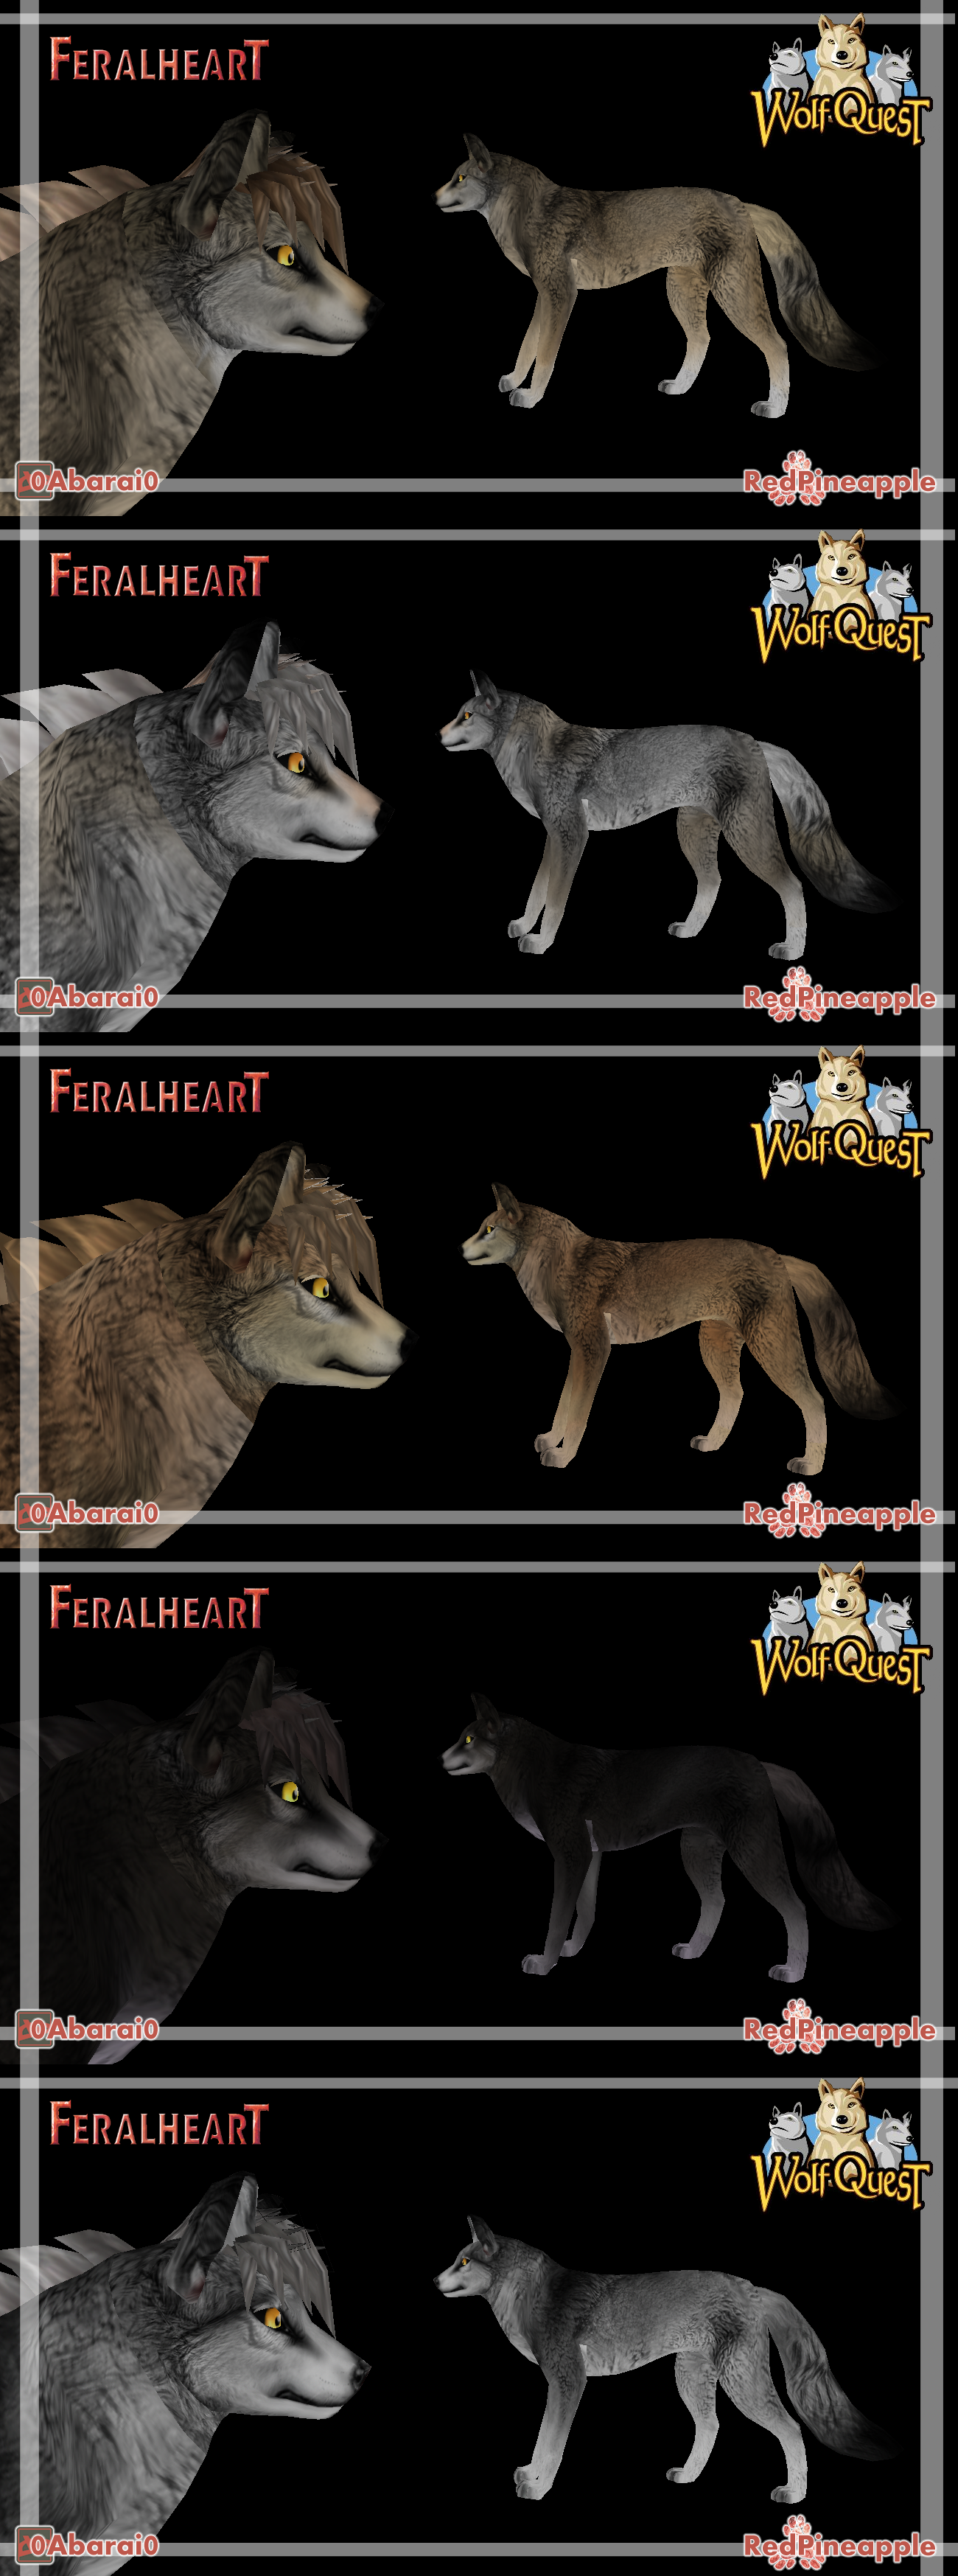 Feral Heart: *OLD* FeralHeart :: FREE WOLFQUEST PRESETS By 0Abarai0 On